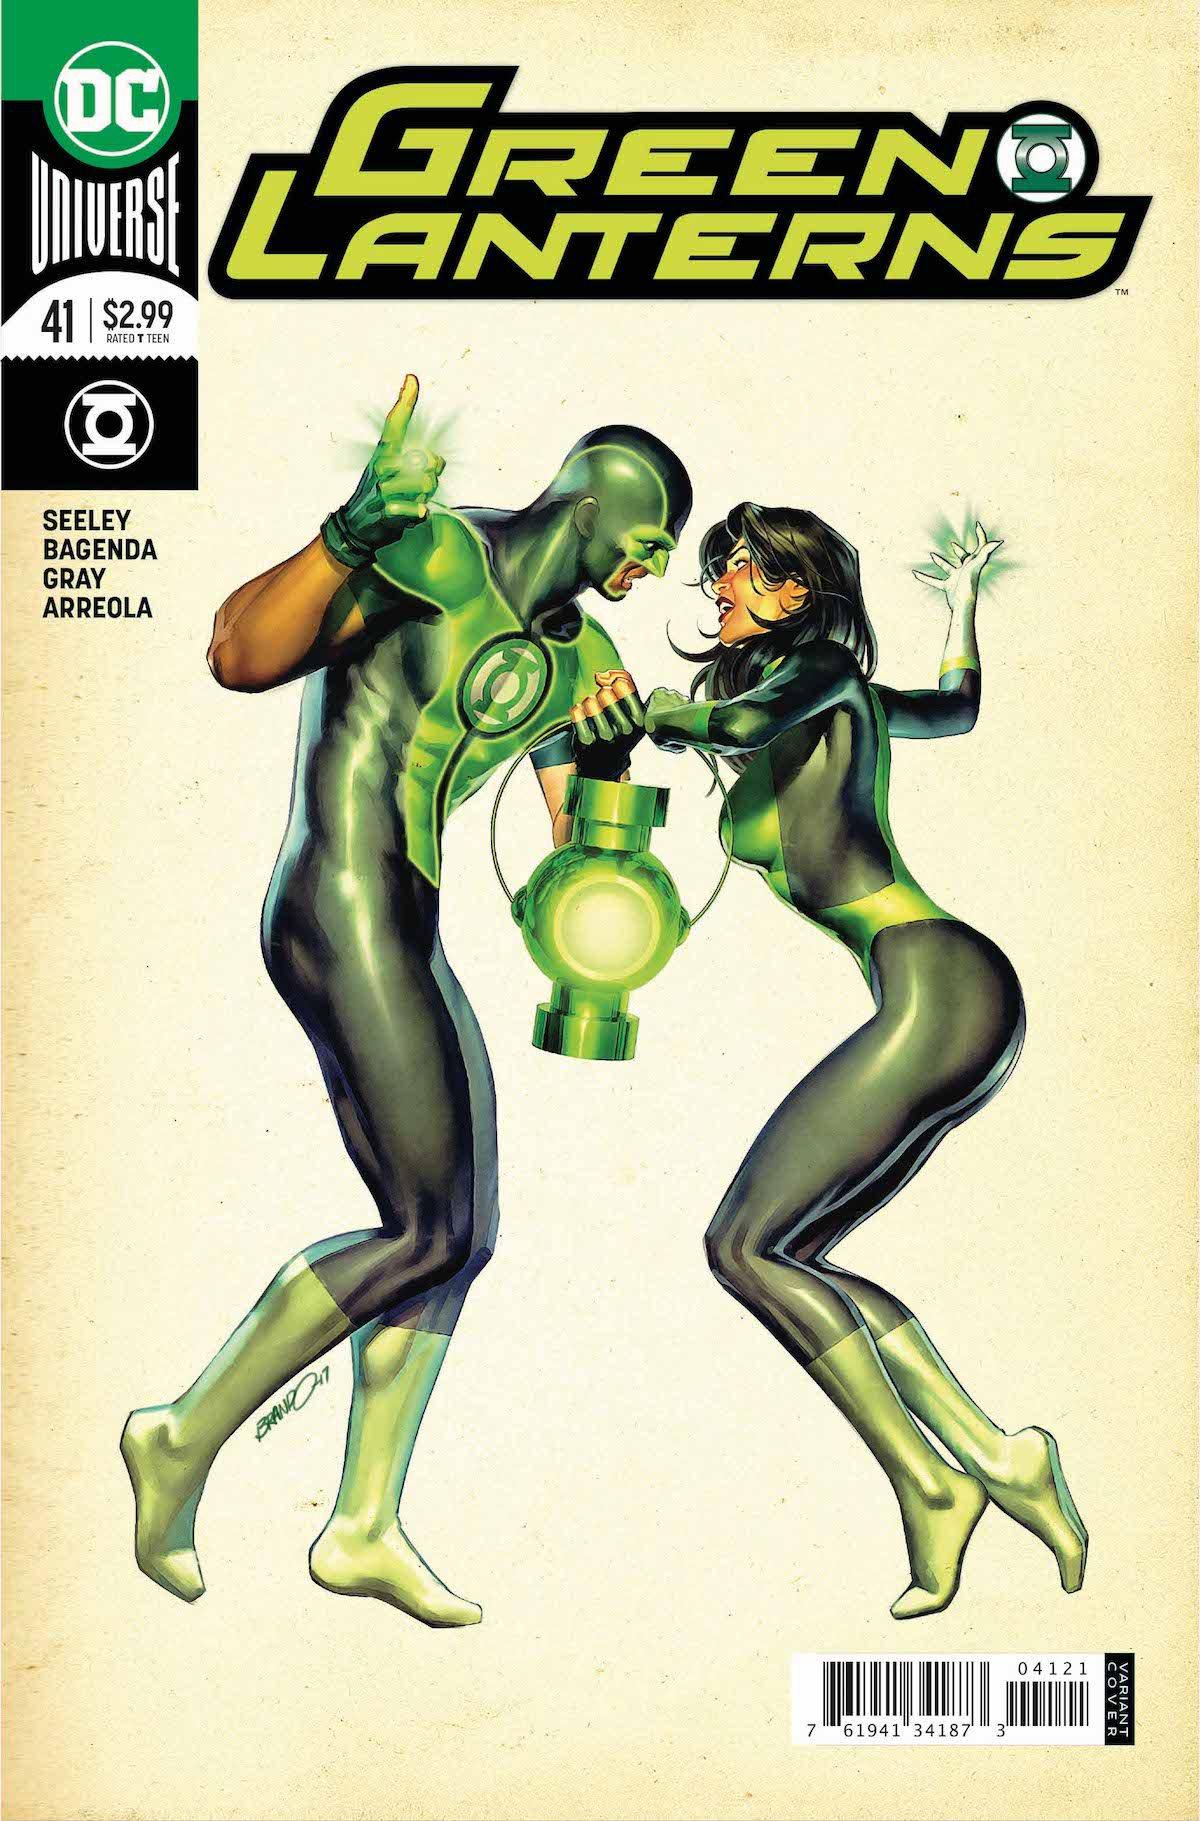 Green Lanterns #41 variant cover